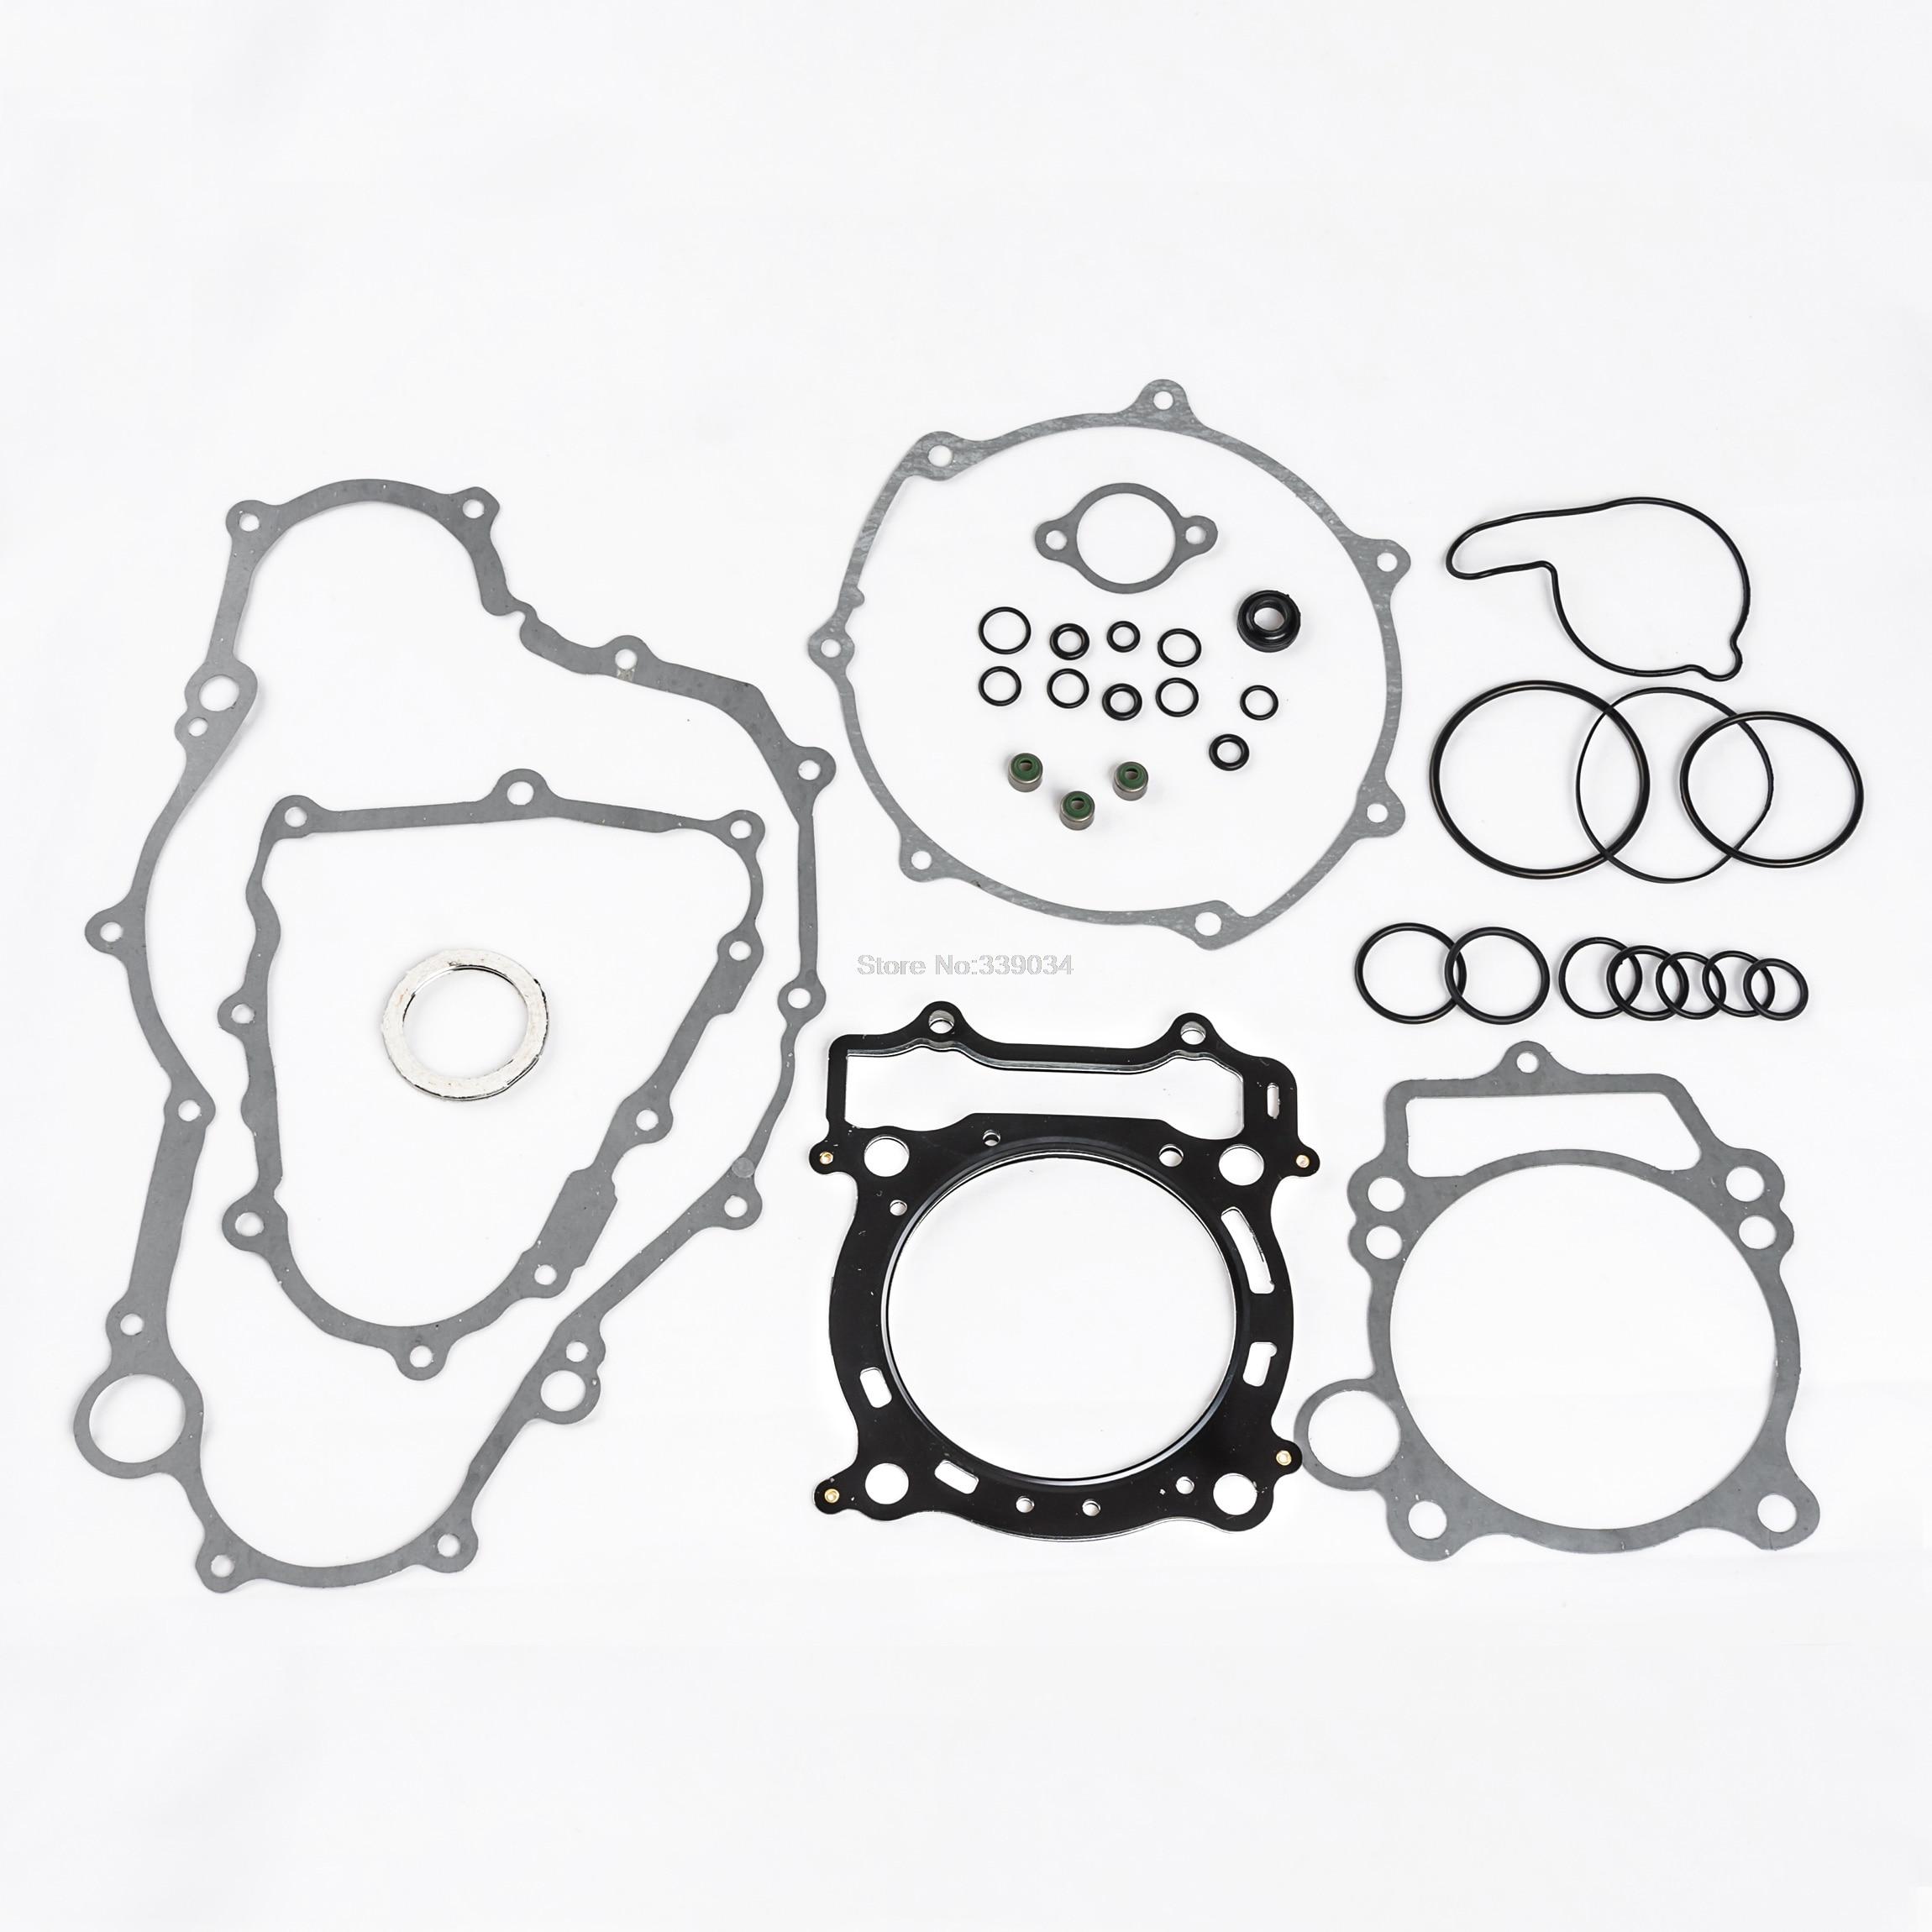 Complete Motorcycle Engine Gasket Set Kit For Yamaha